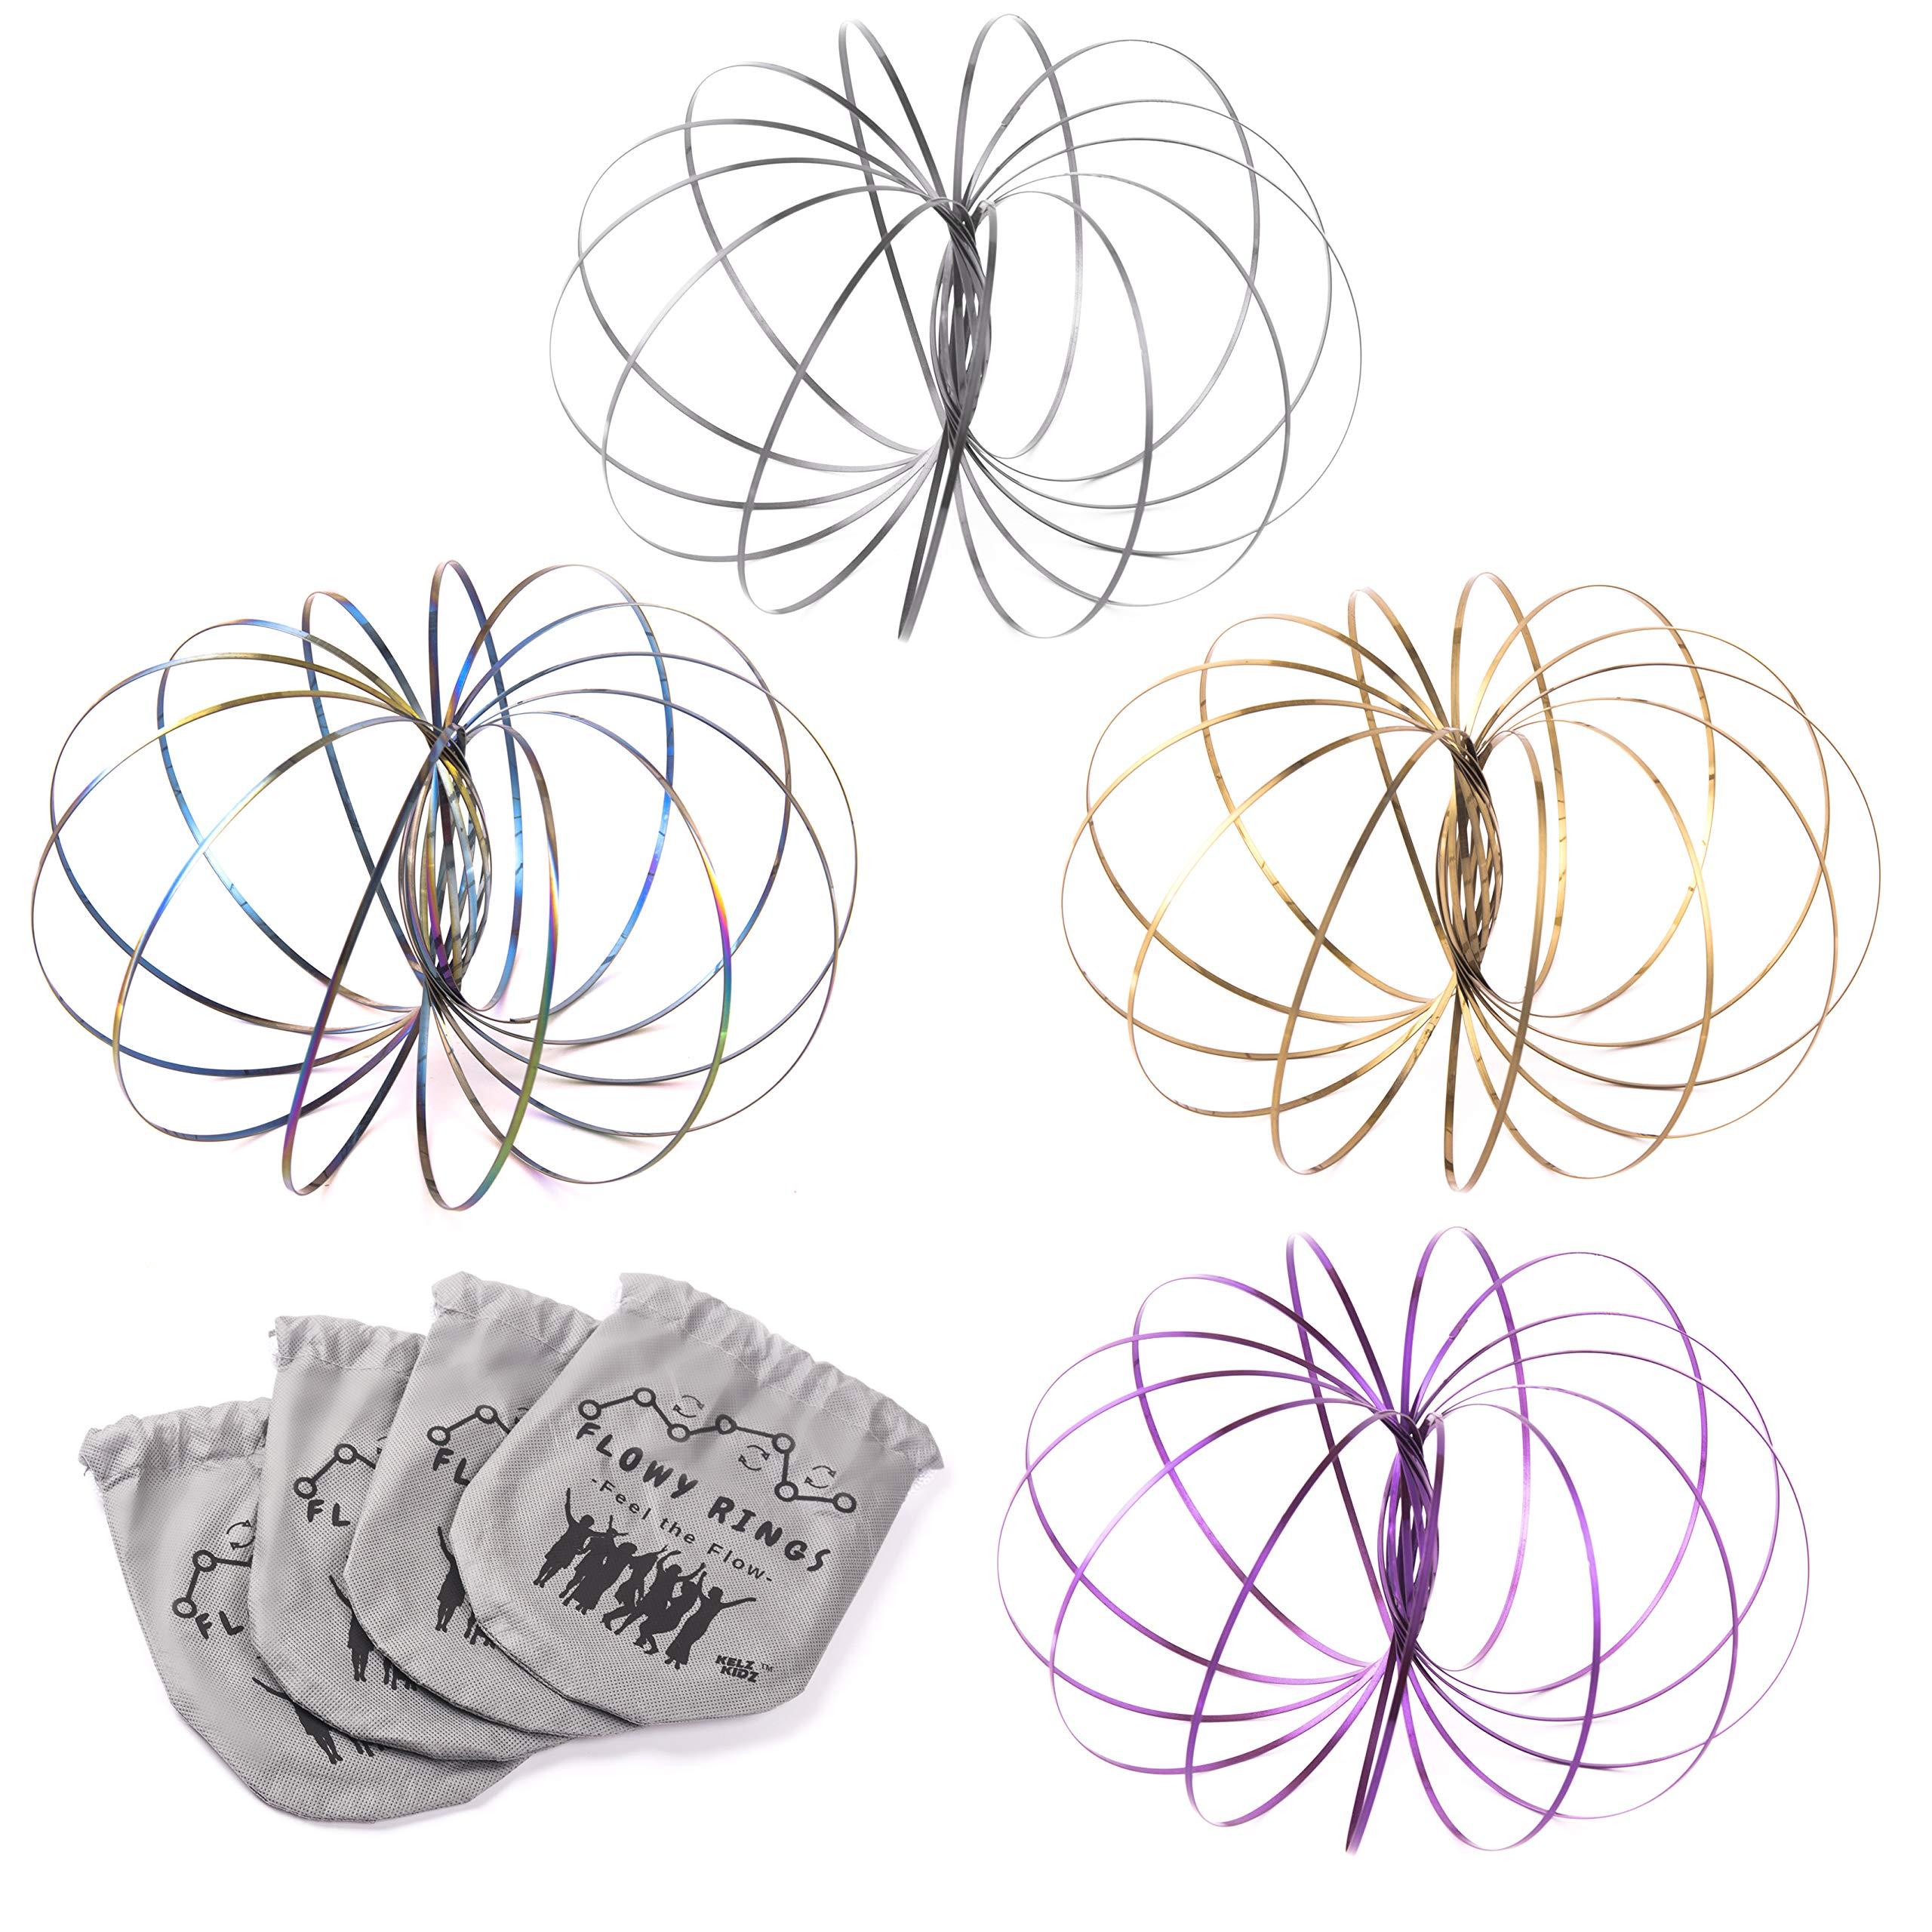 KELZ KIDZ Kinetic 3D Flow Rings Made from High Grade Stainless Steel (12 Pack Assorted)